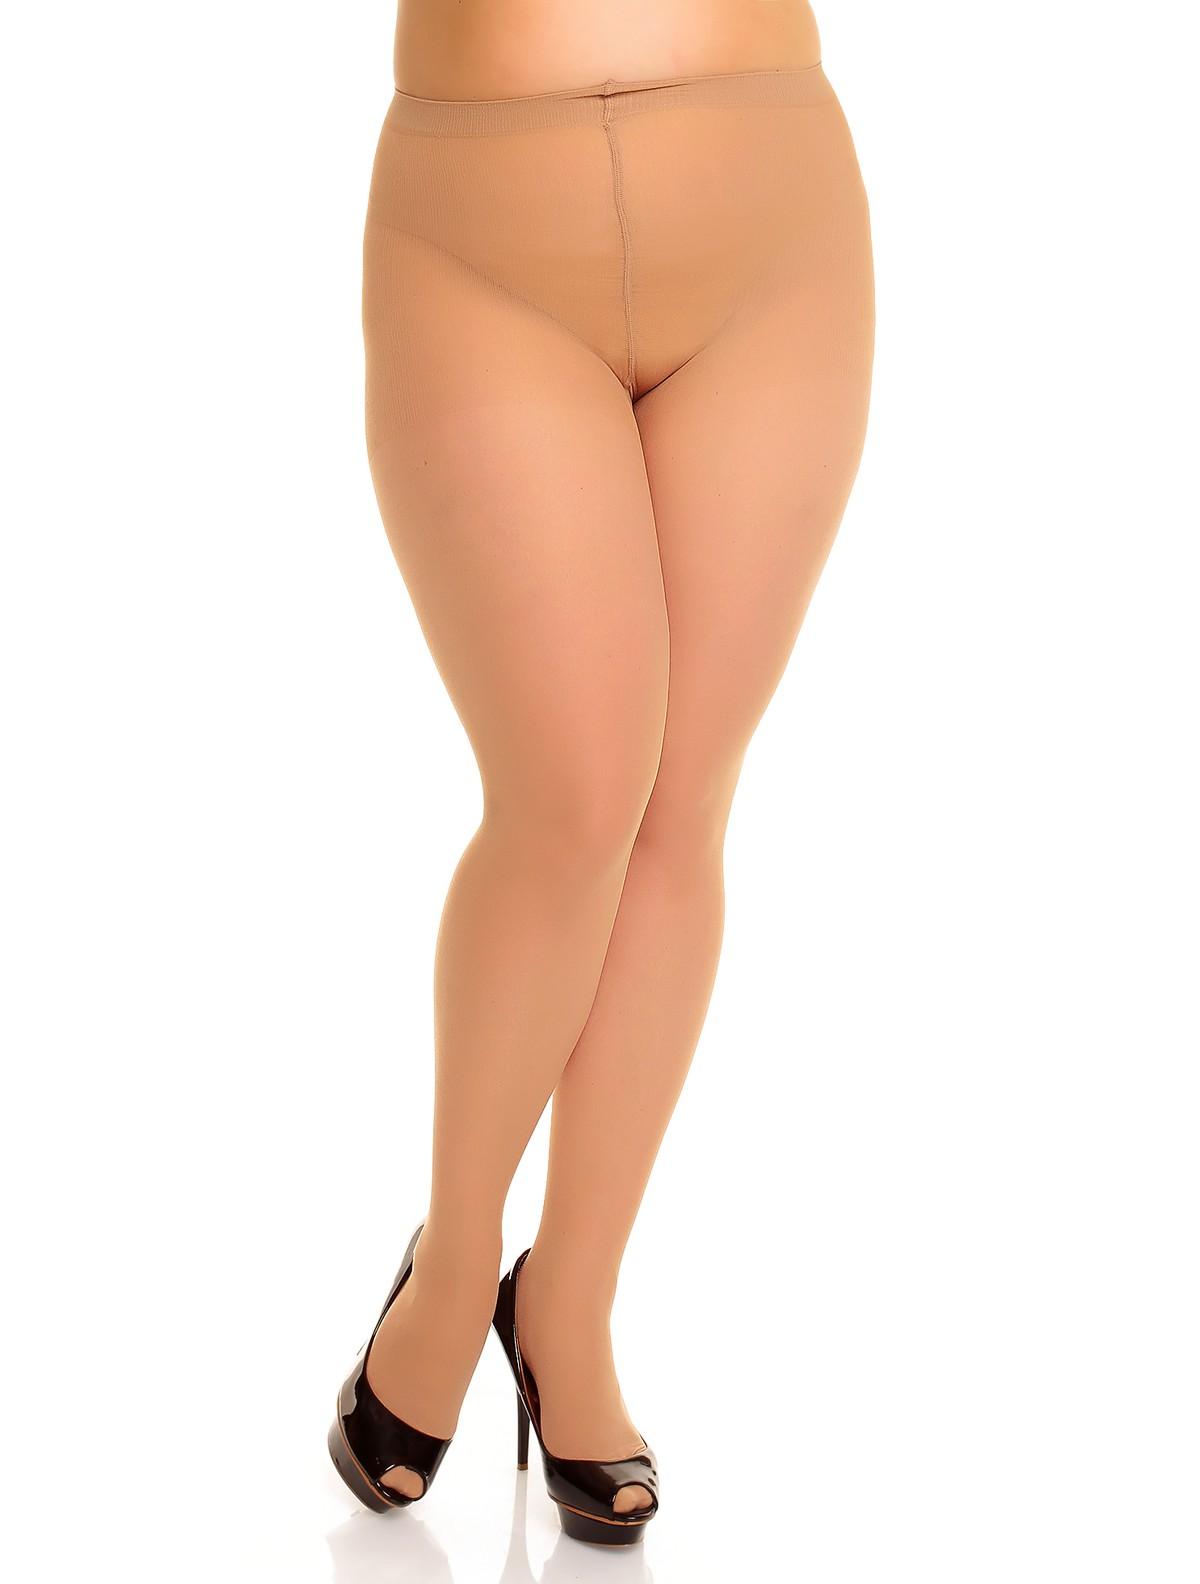 Compression Pantyhose Plus Sizes 53